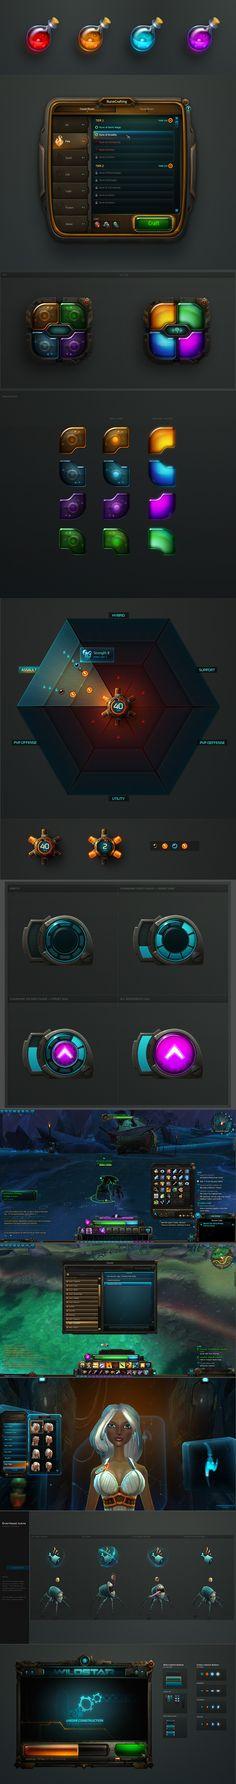 South Korea game technology mechanical metal wind UI assets